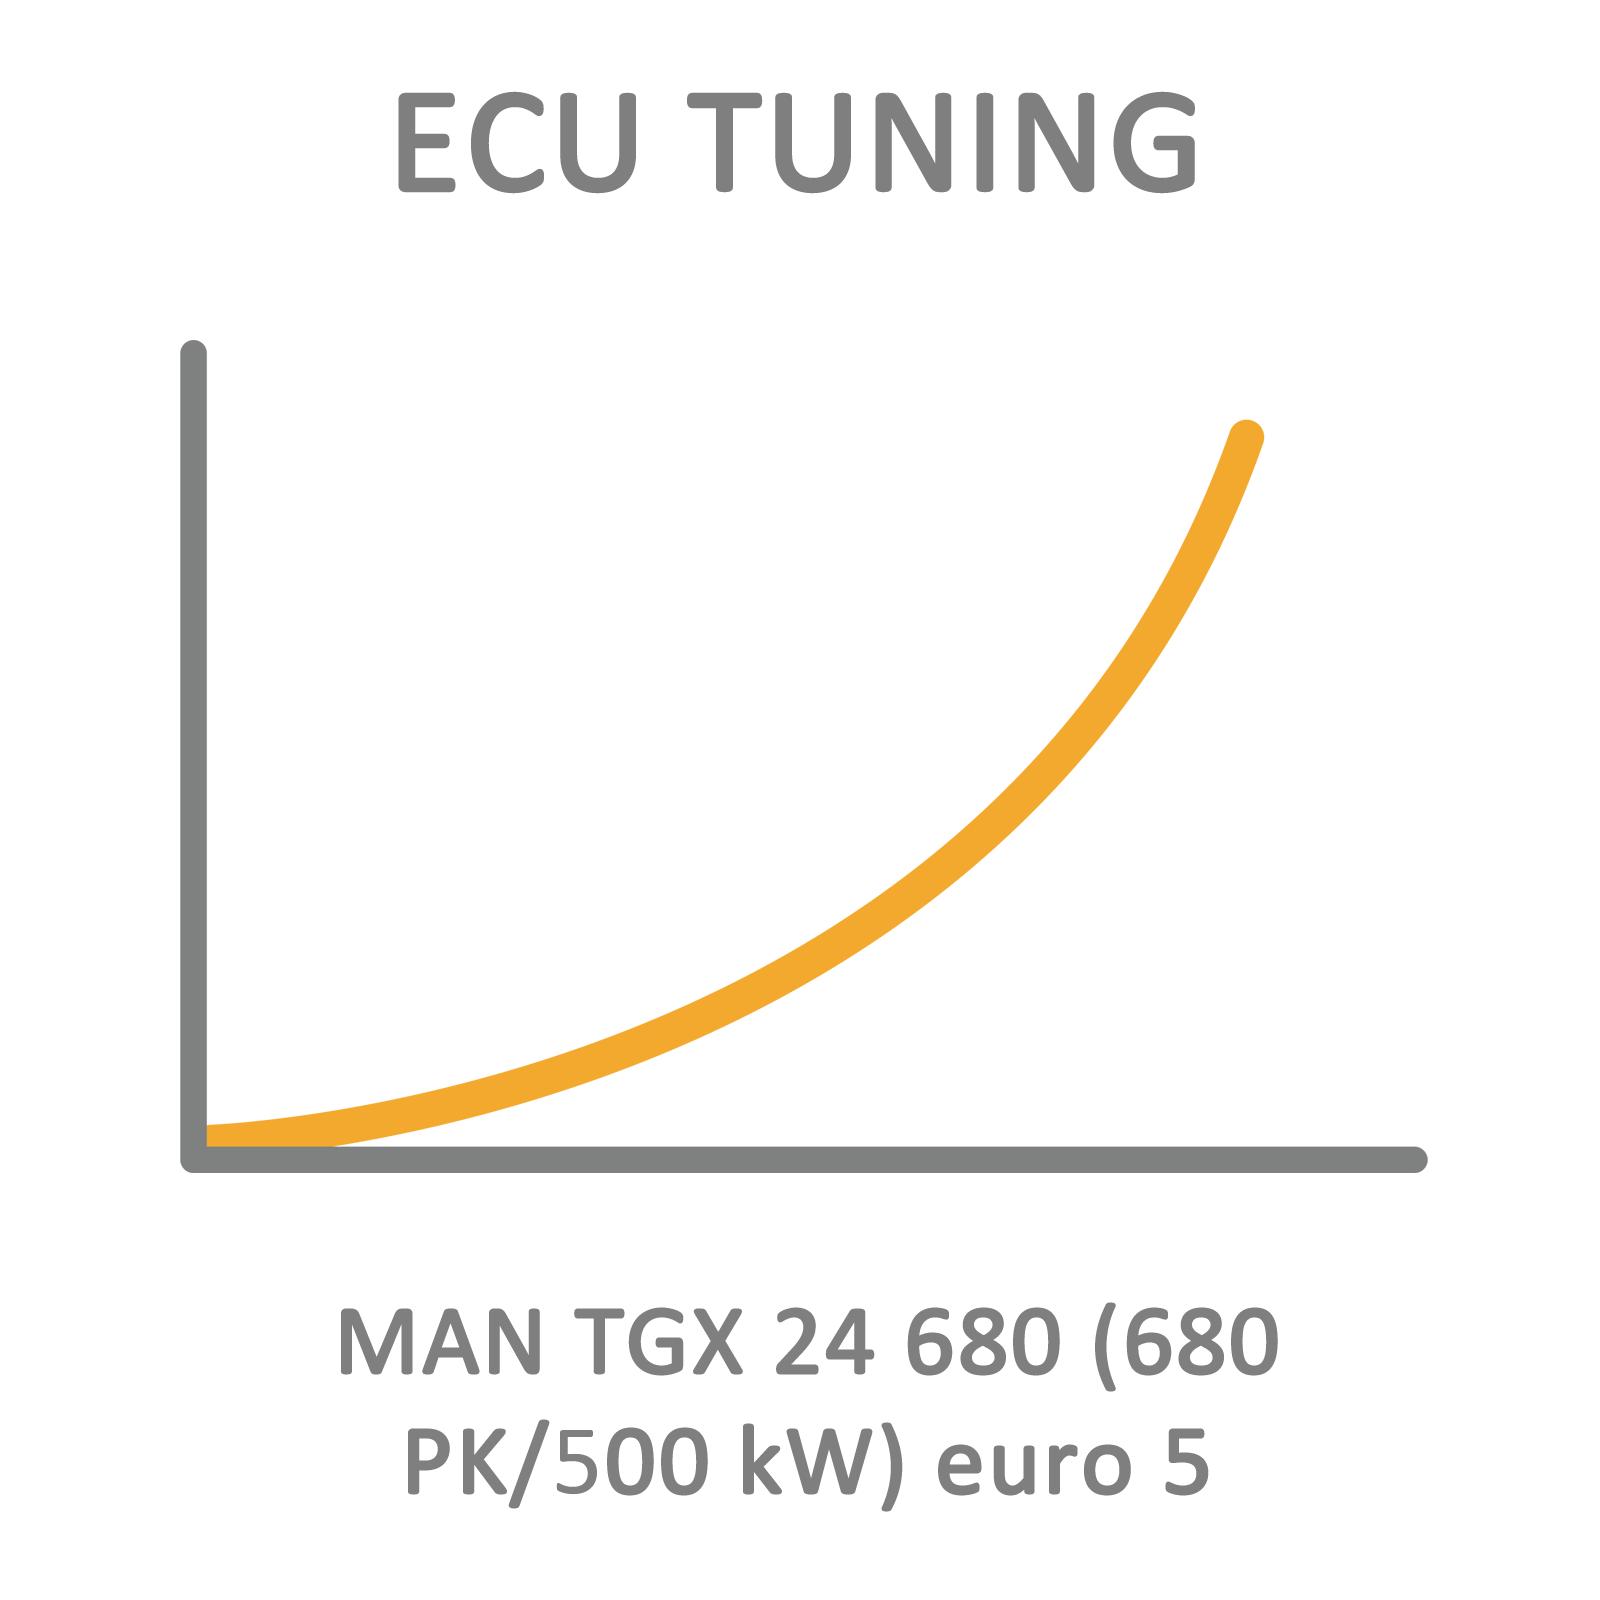 MAN TGX 24 680 (680 PK/500 kW) euro 5 ECU Tuning Remapping